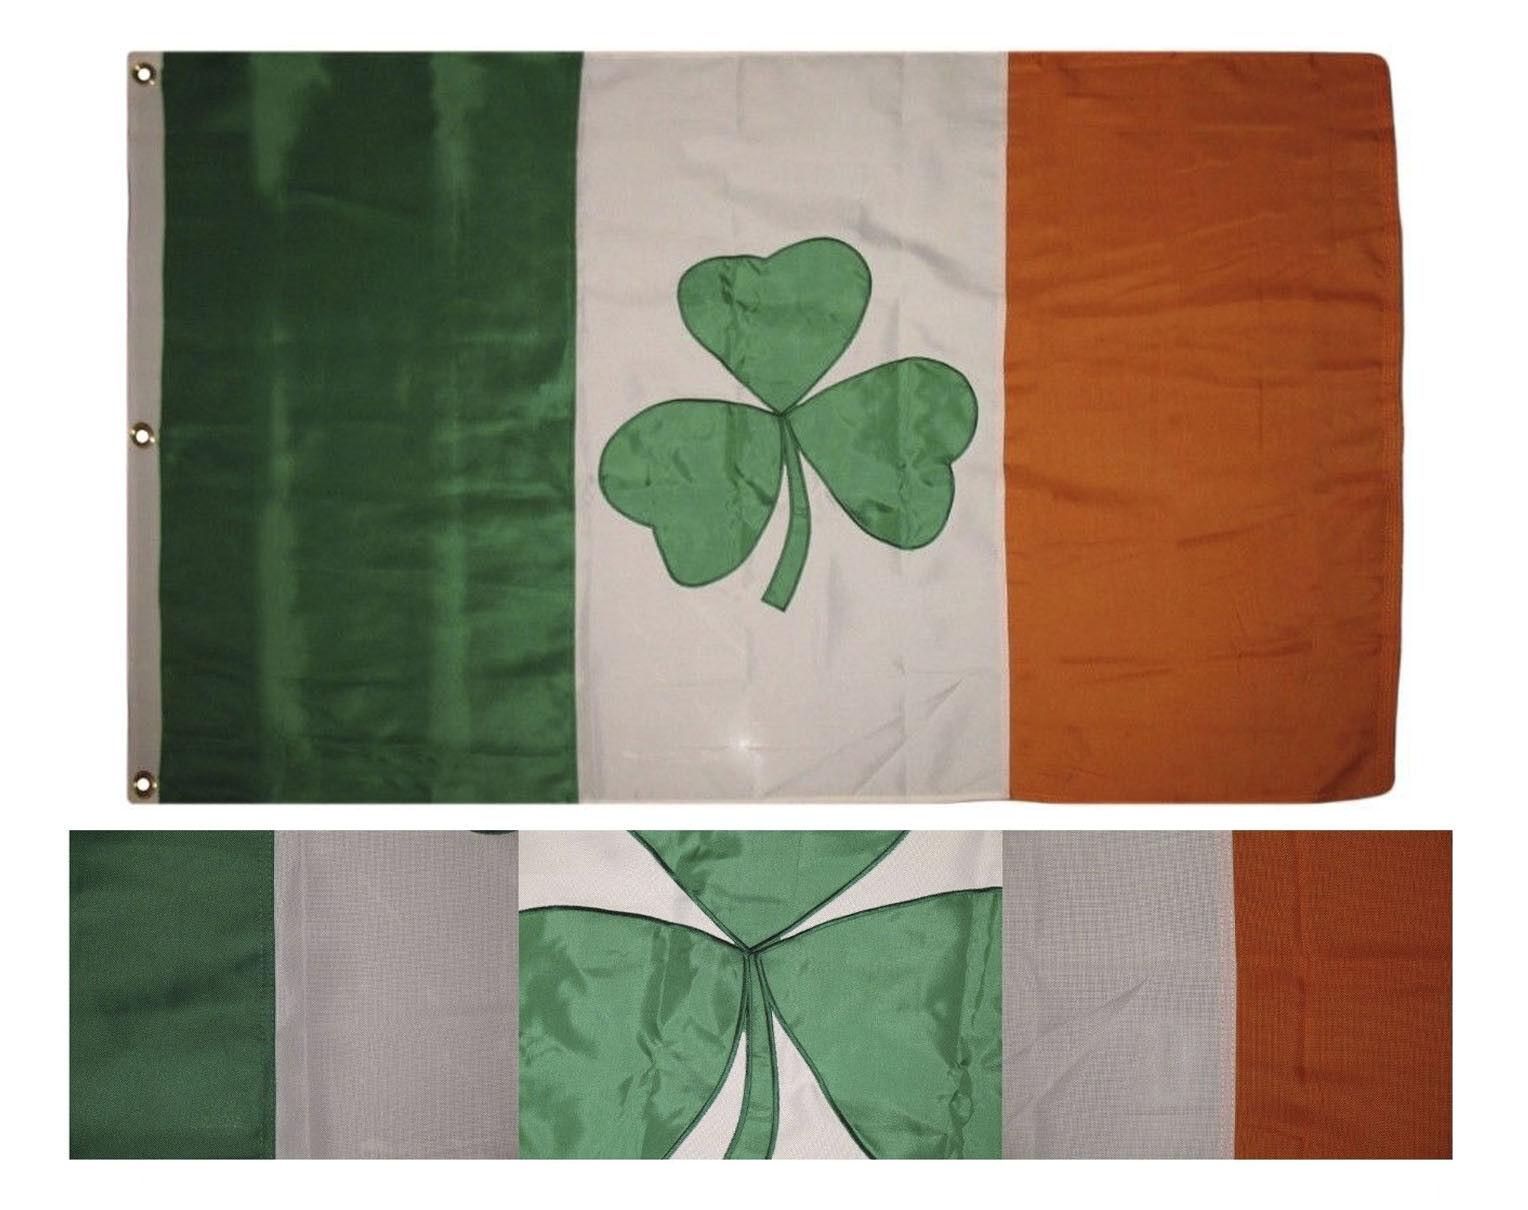 3x5 Embroidered Sewn Ireland Irish Shamrock 2ply 300D Nylon